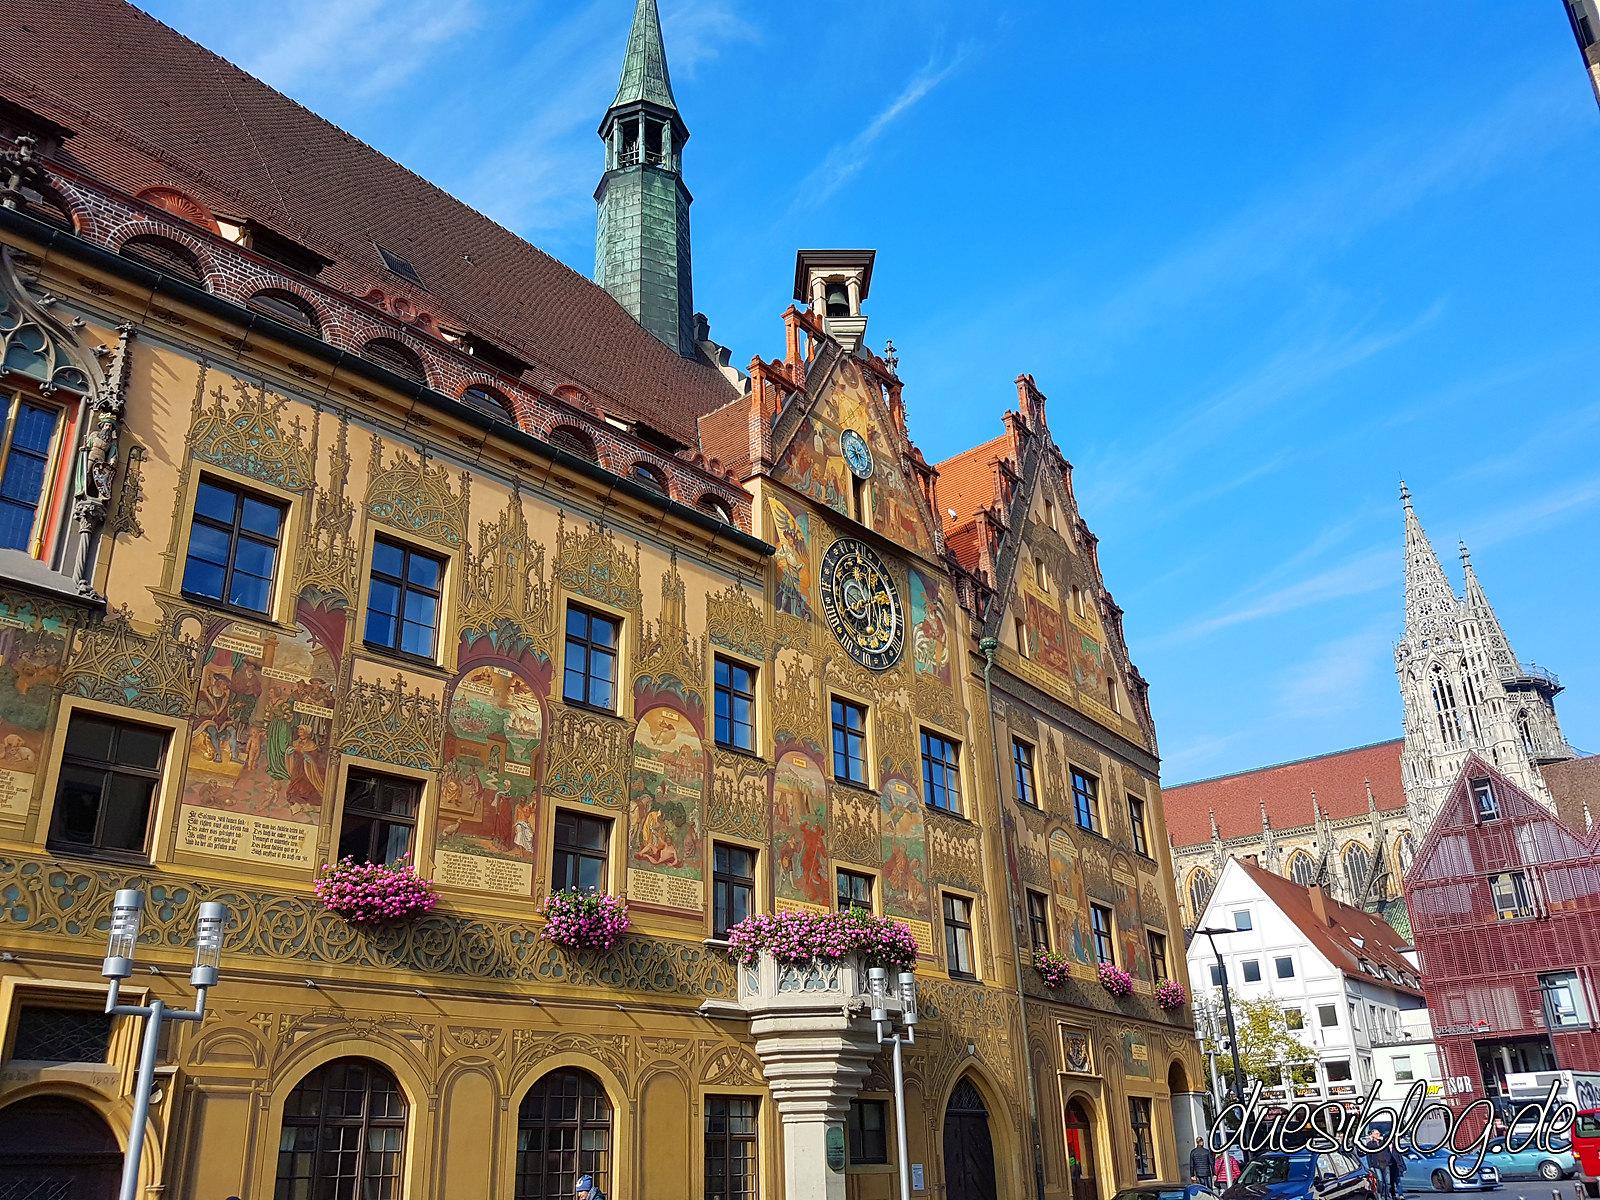 Ulm Rathaus travelblog duesiblog 04